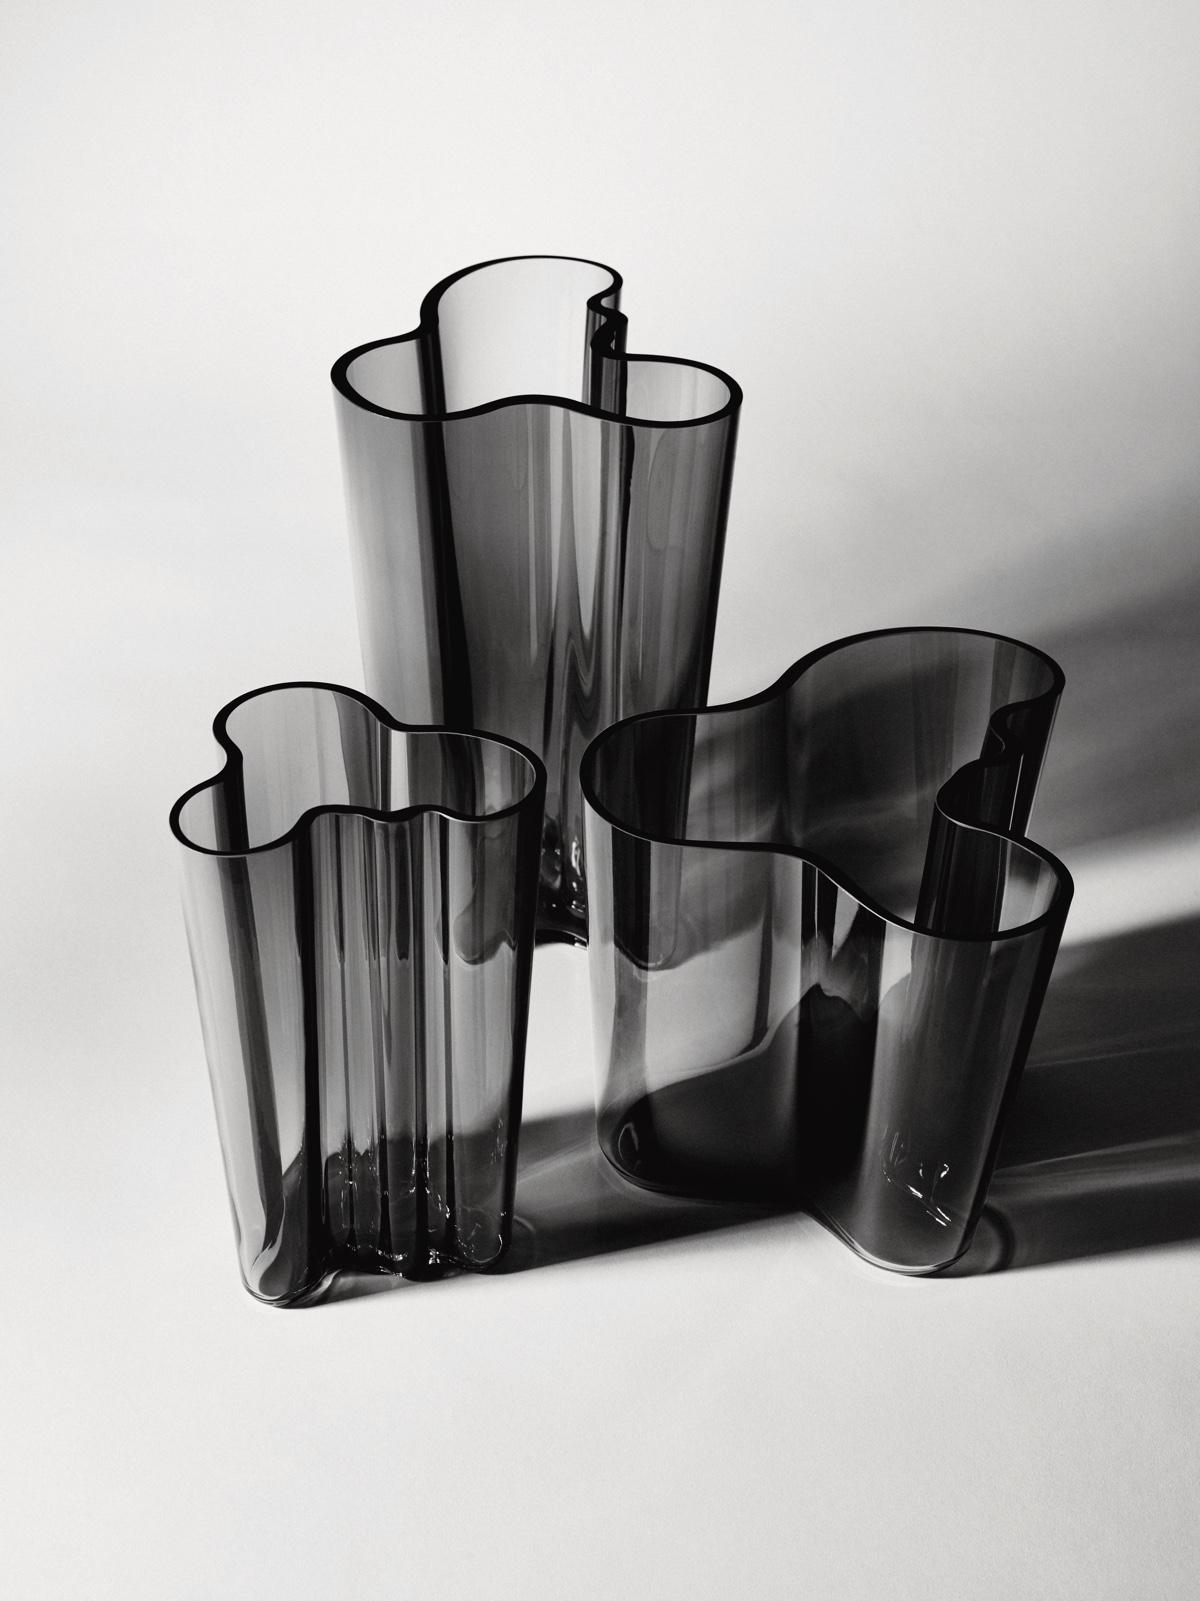 fancy leather chair covers ivory finnish design genius: alvar aalto, artek and the aalto vase